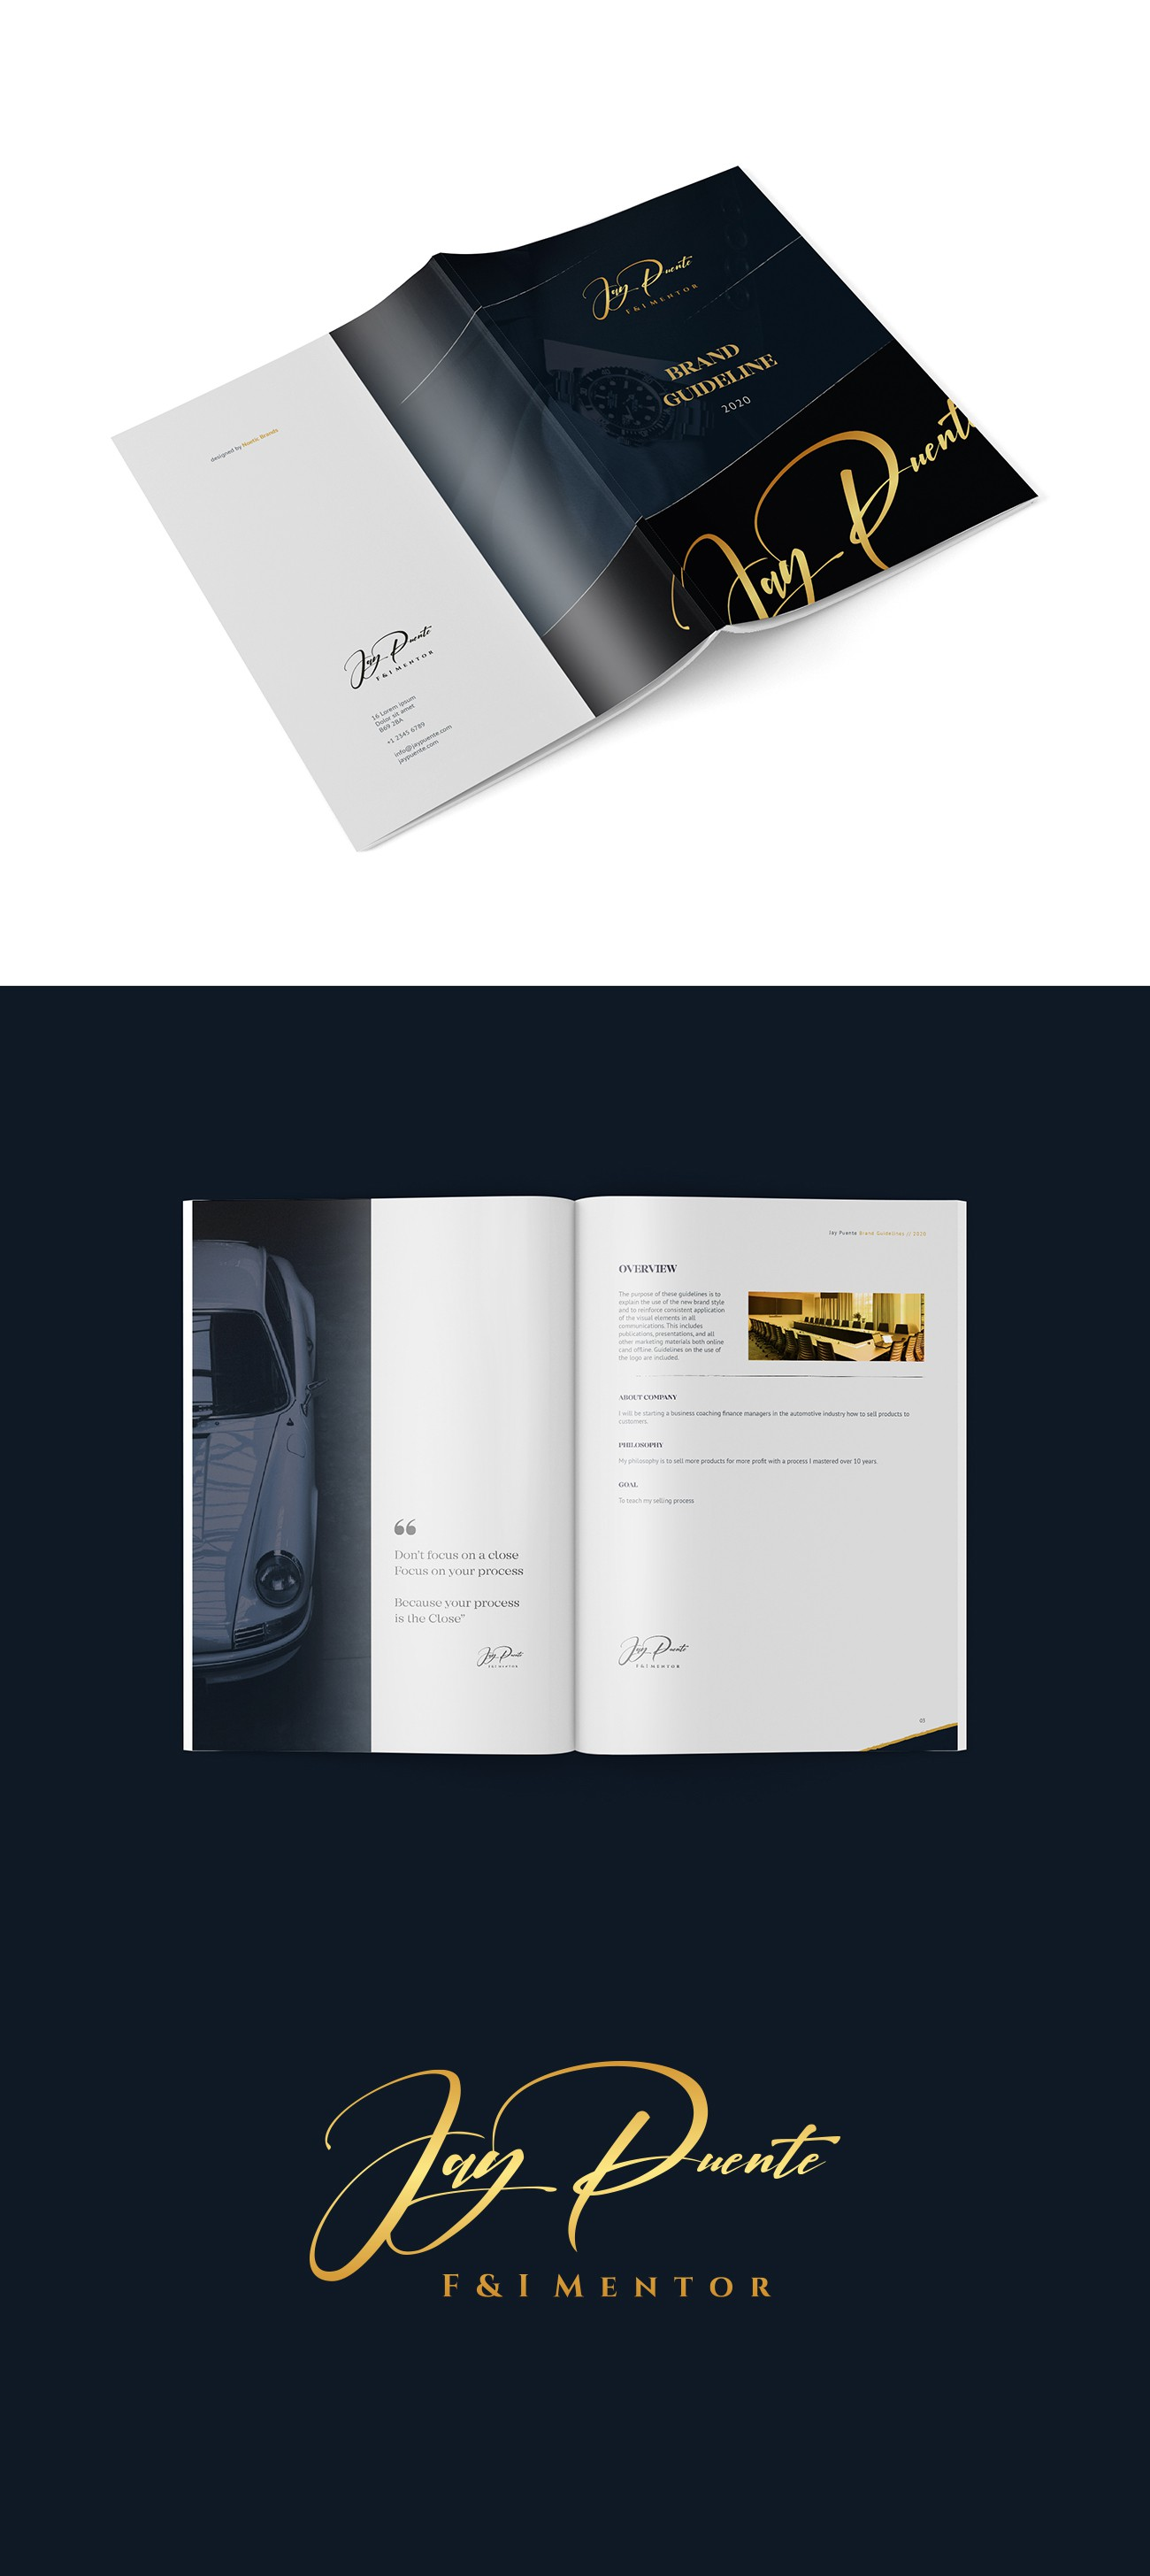 Jay Puente - Standard Brand Guide